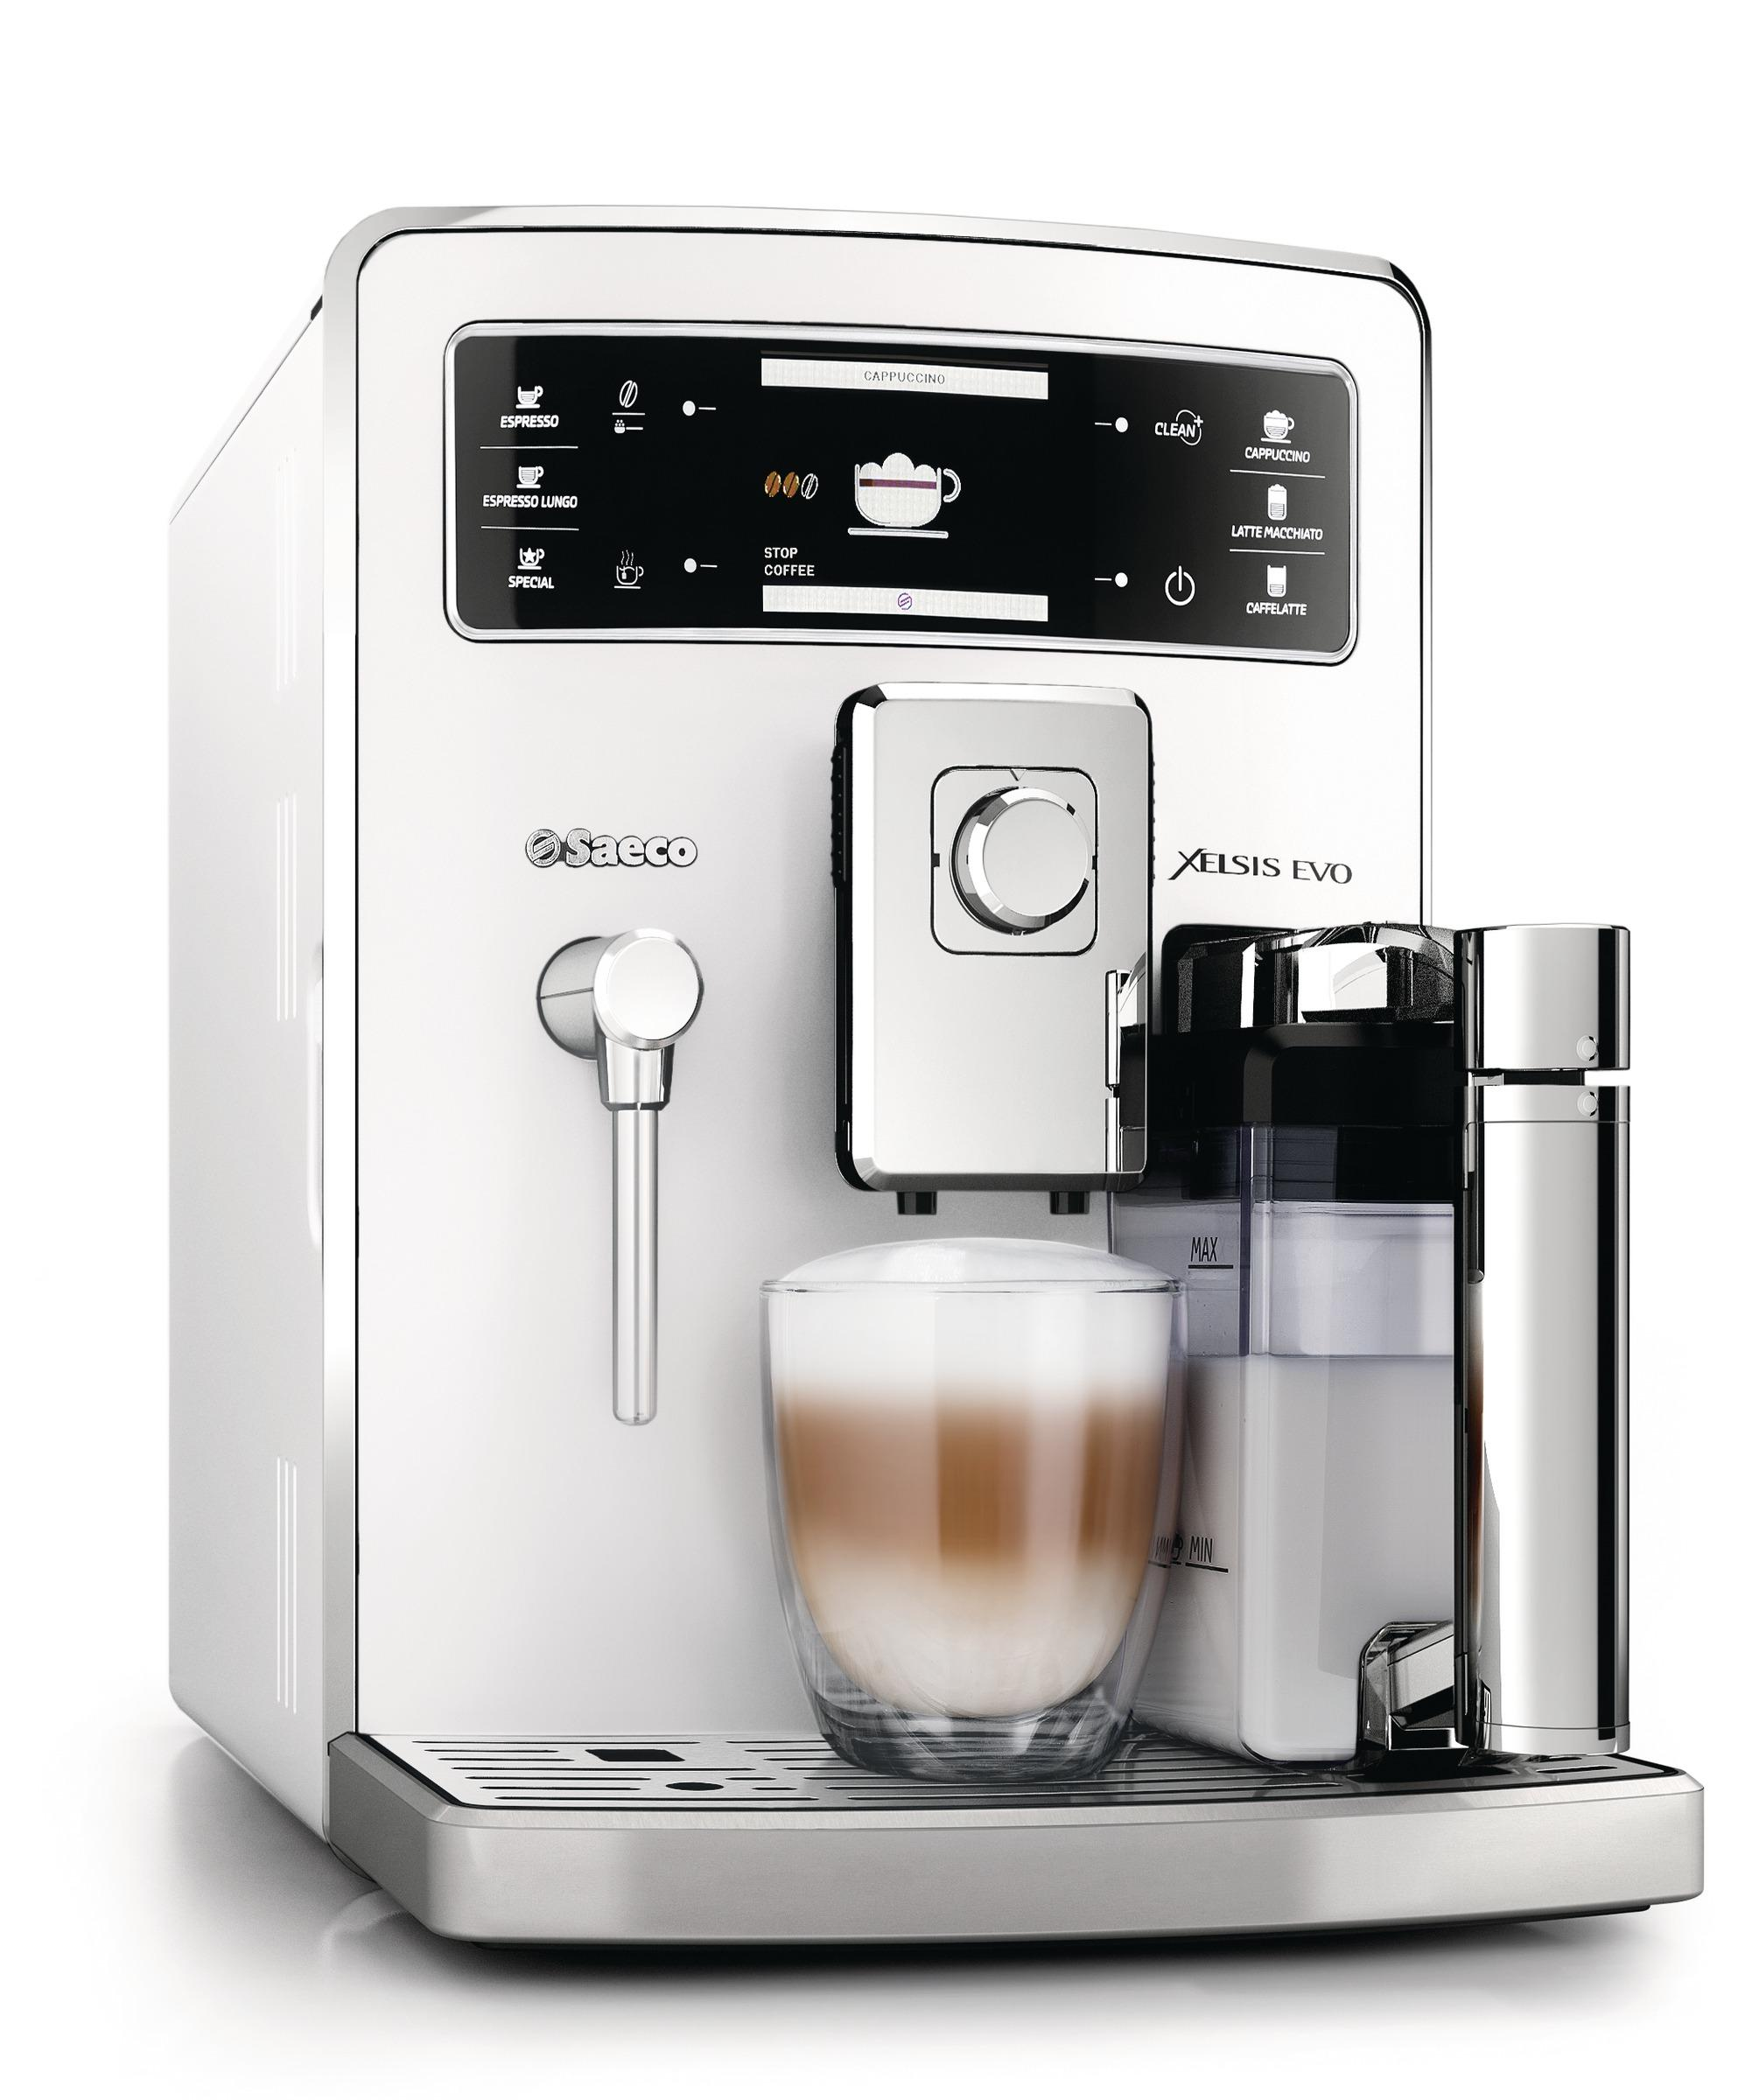 saeco hd8953 21 xelsis evo kaffeevollautomat 15 bar integrierte milchkaraffe wei. Black Bedroom Furniture Sets. Home Design Ideas